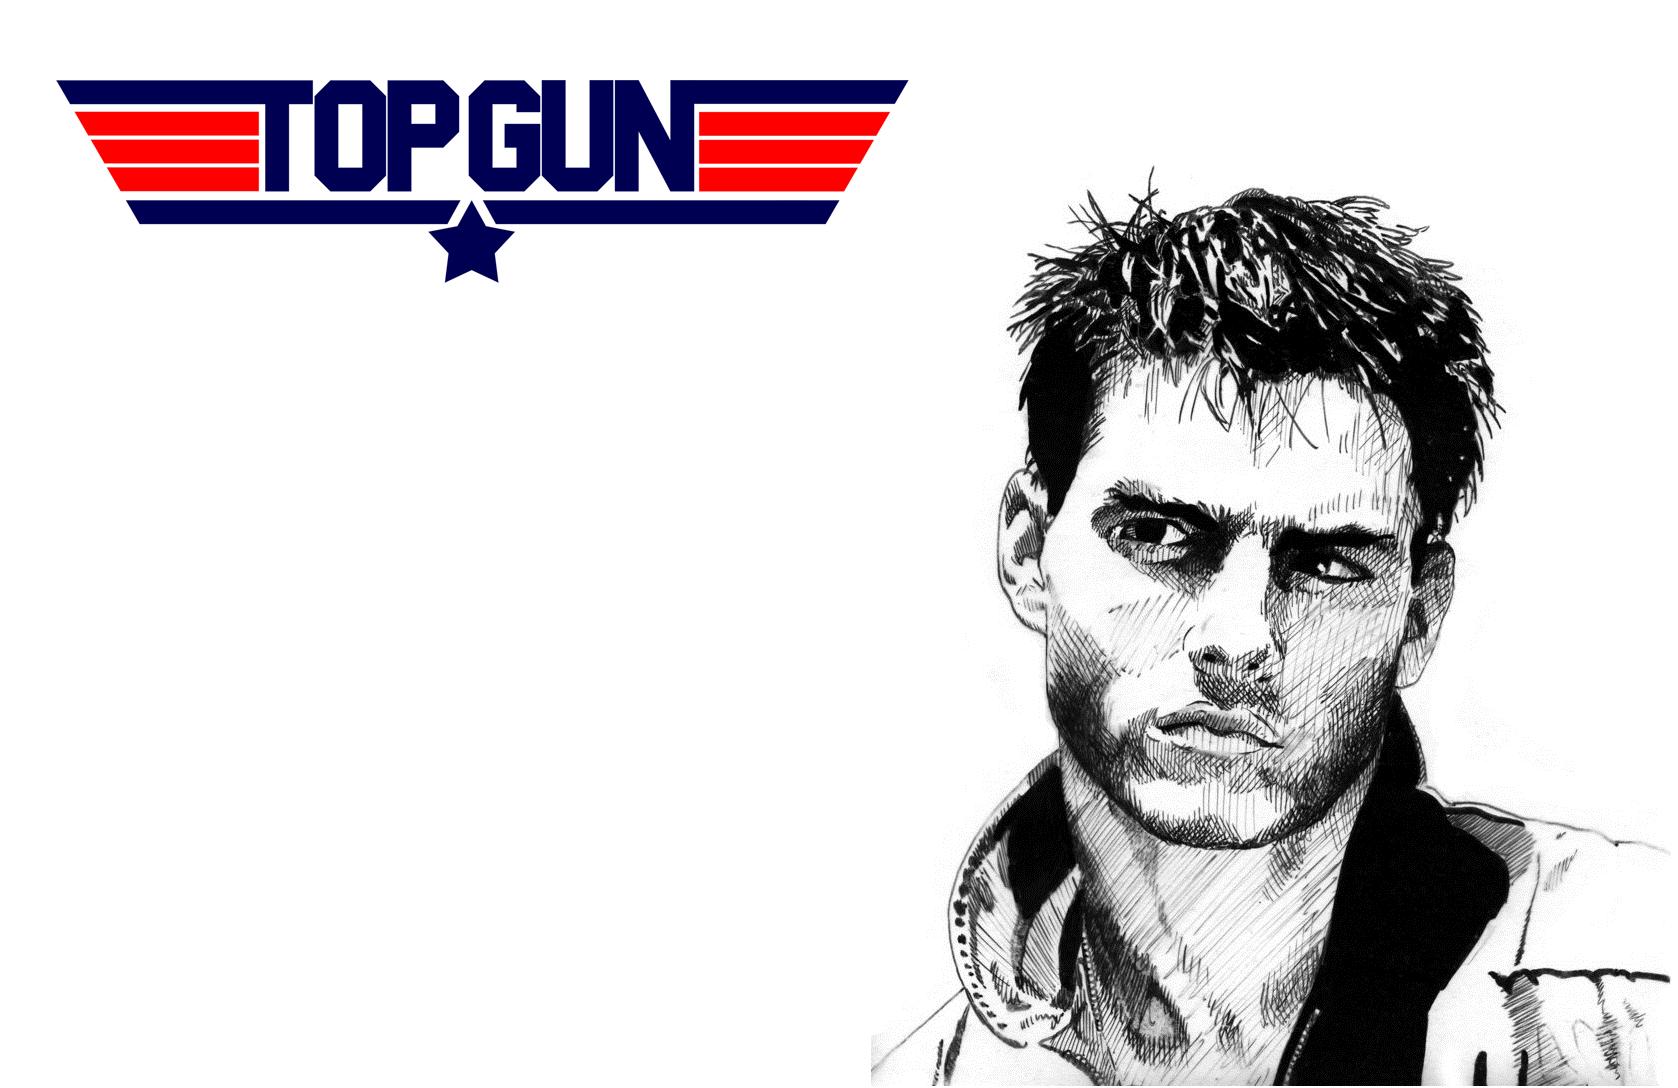 066c5601992585d7ff2e2b7ee703cacb_top-gun-movies-pinterest-top-gun-drawing_1678-1088.png